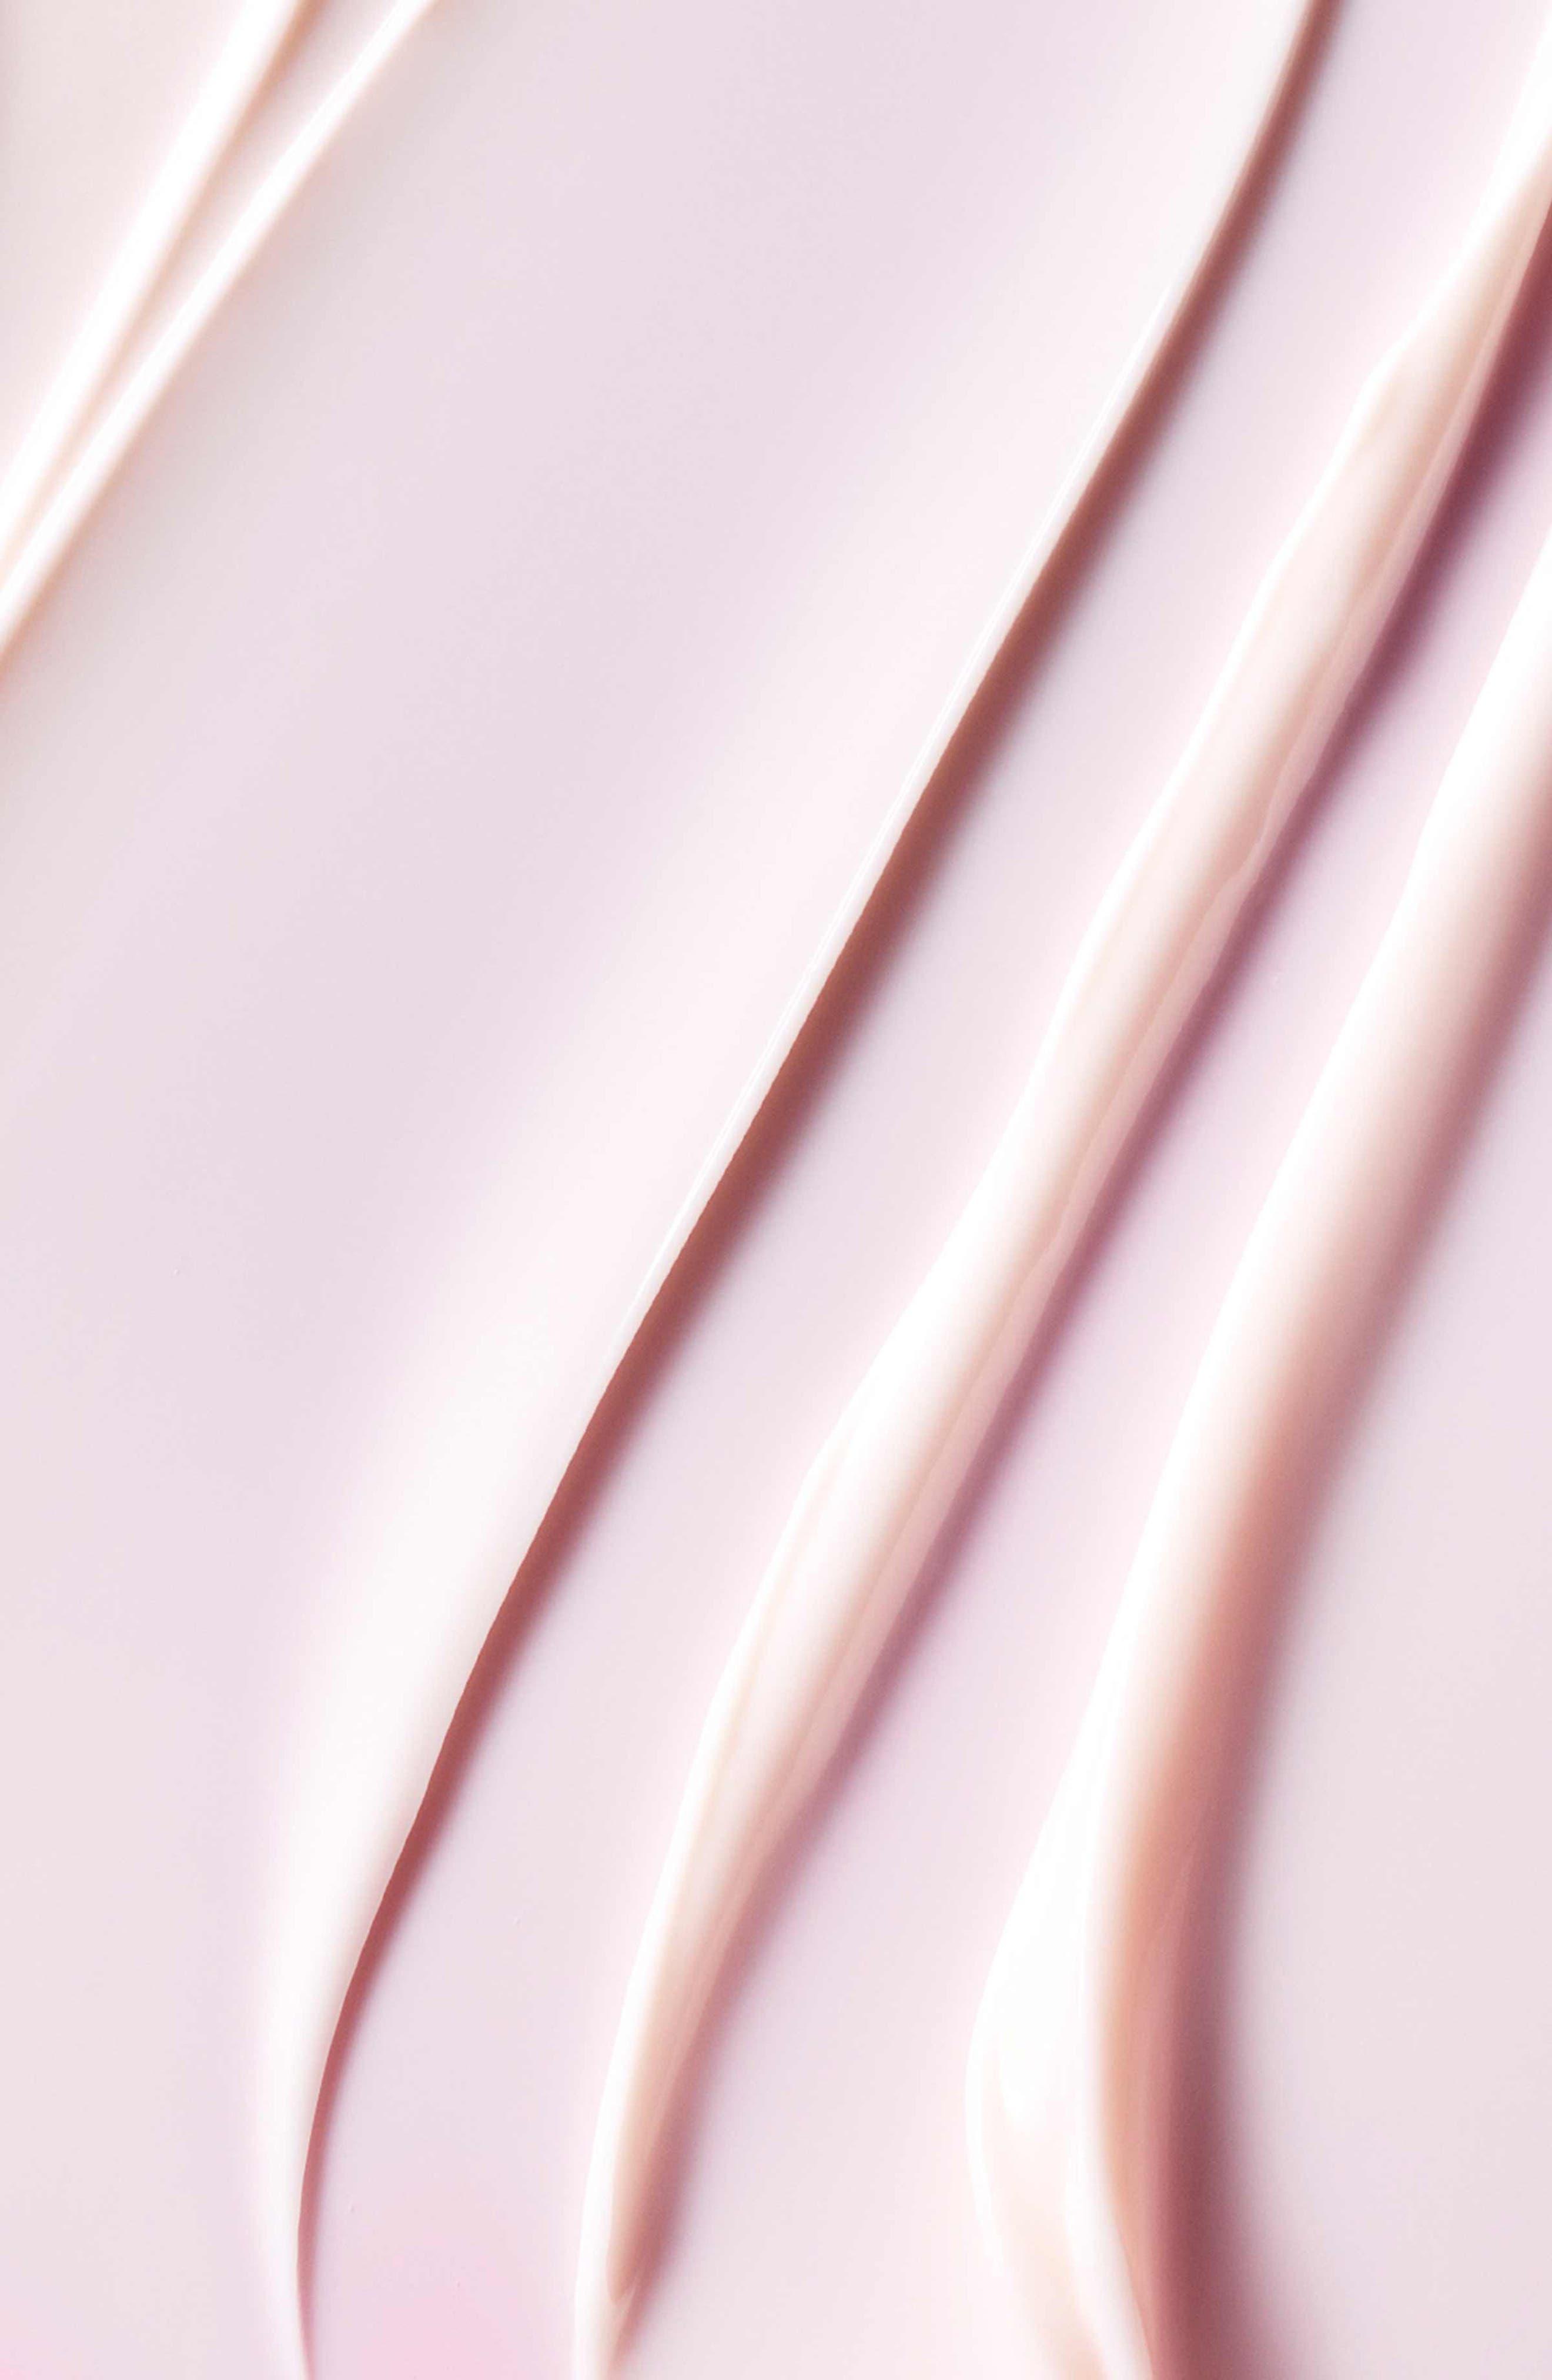 ESTÉE LAUDER, Resilience Multi-Effect Tri-Peptide Face and Neck Creme SPF 15 for Normal/Combination Skin, Alternate thumbnail 3, color, NO COLOR